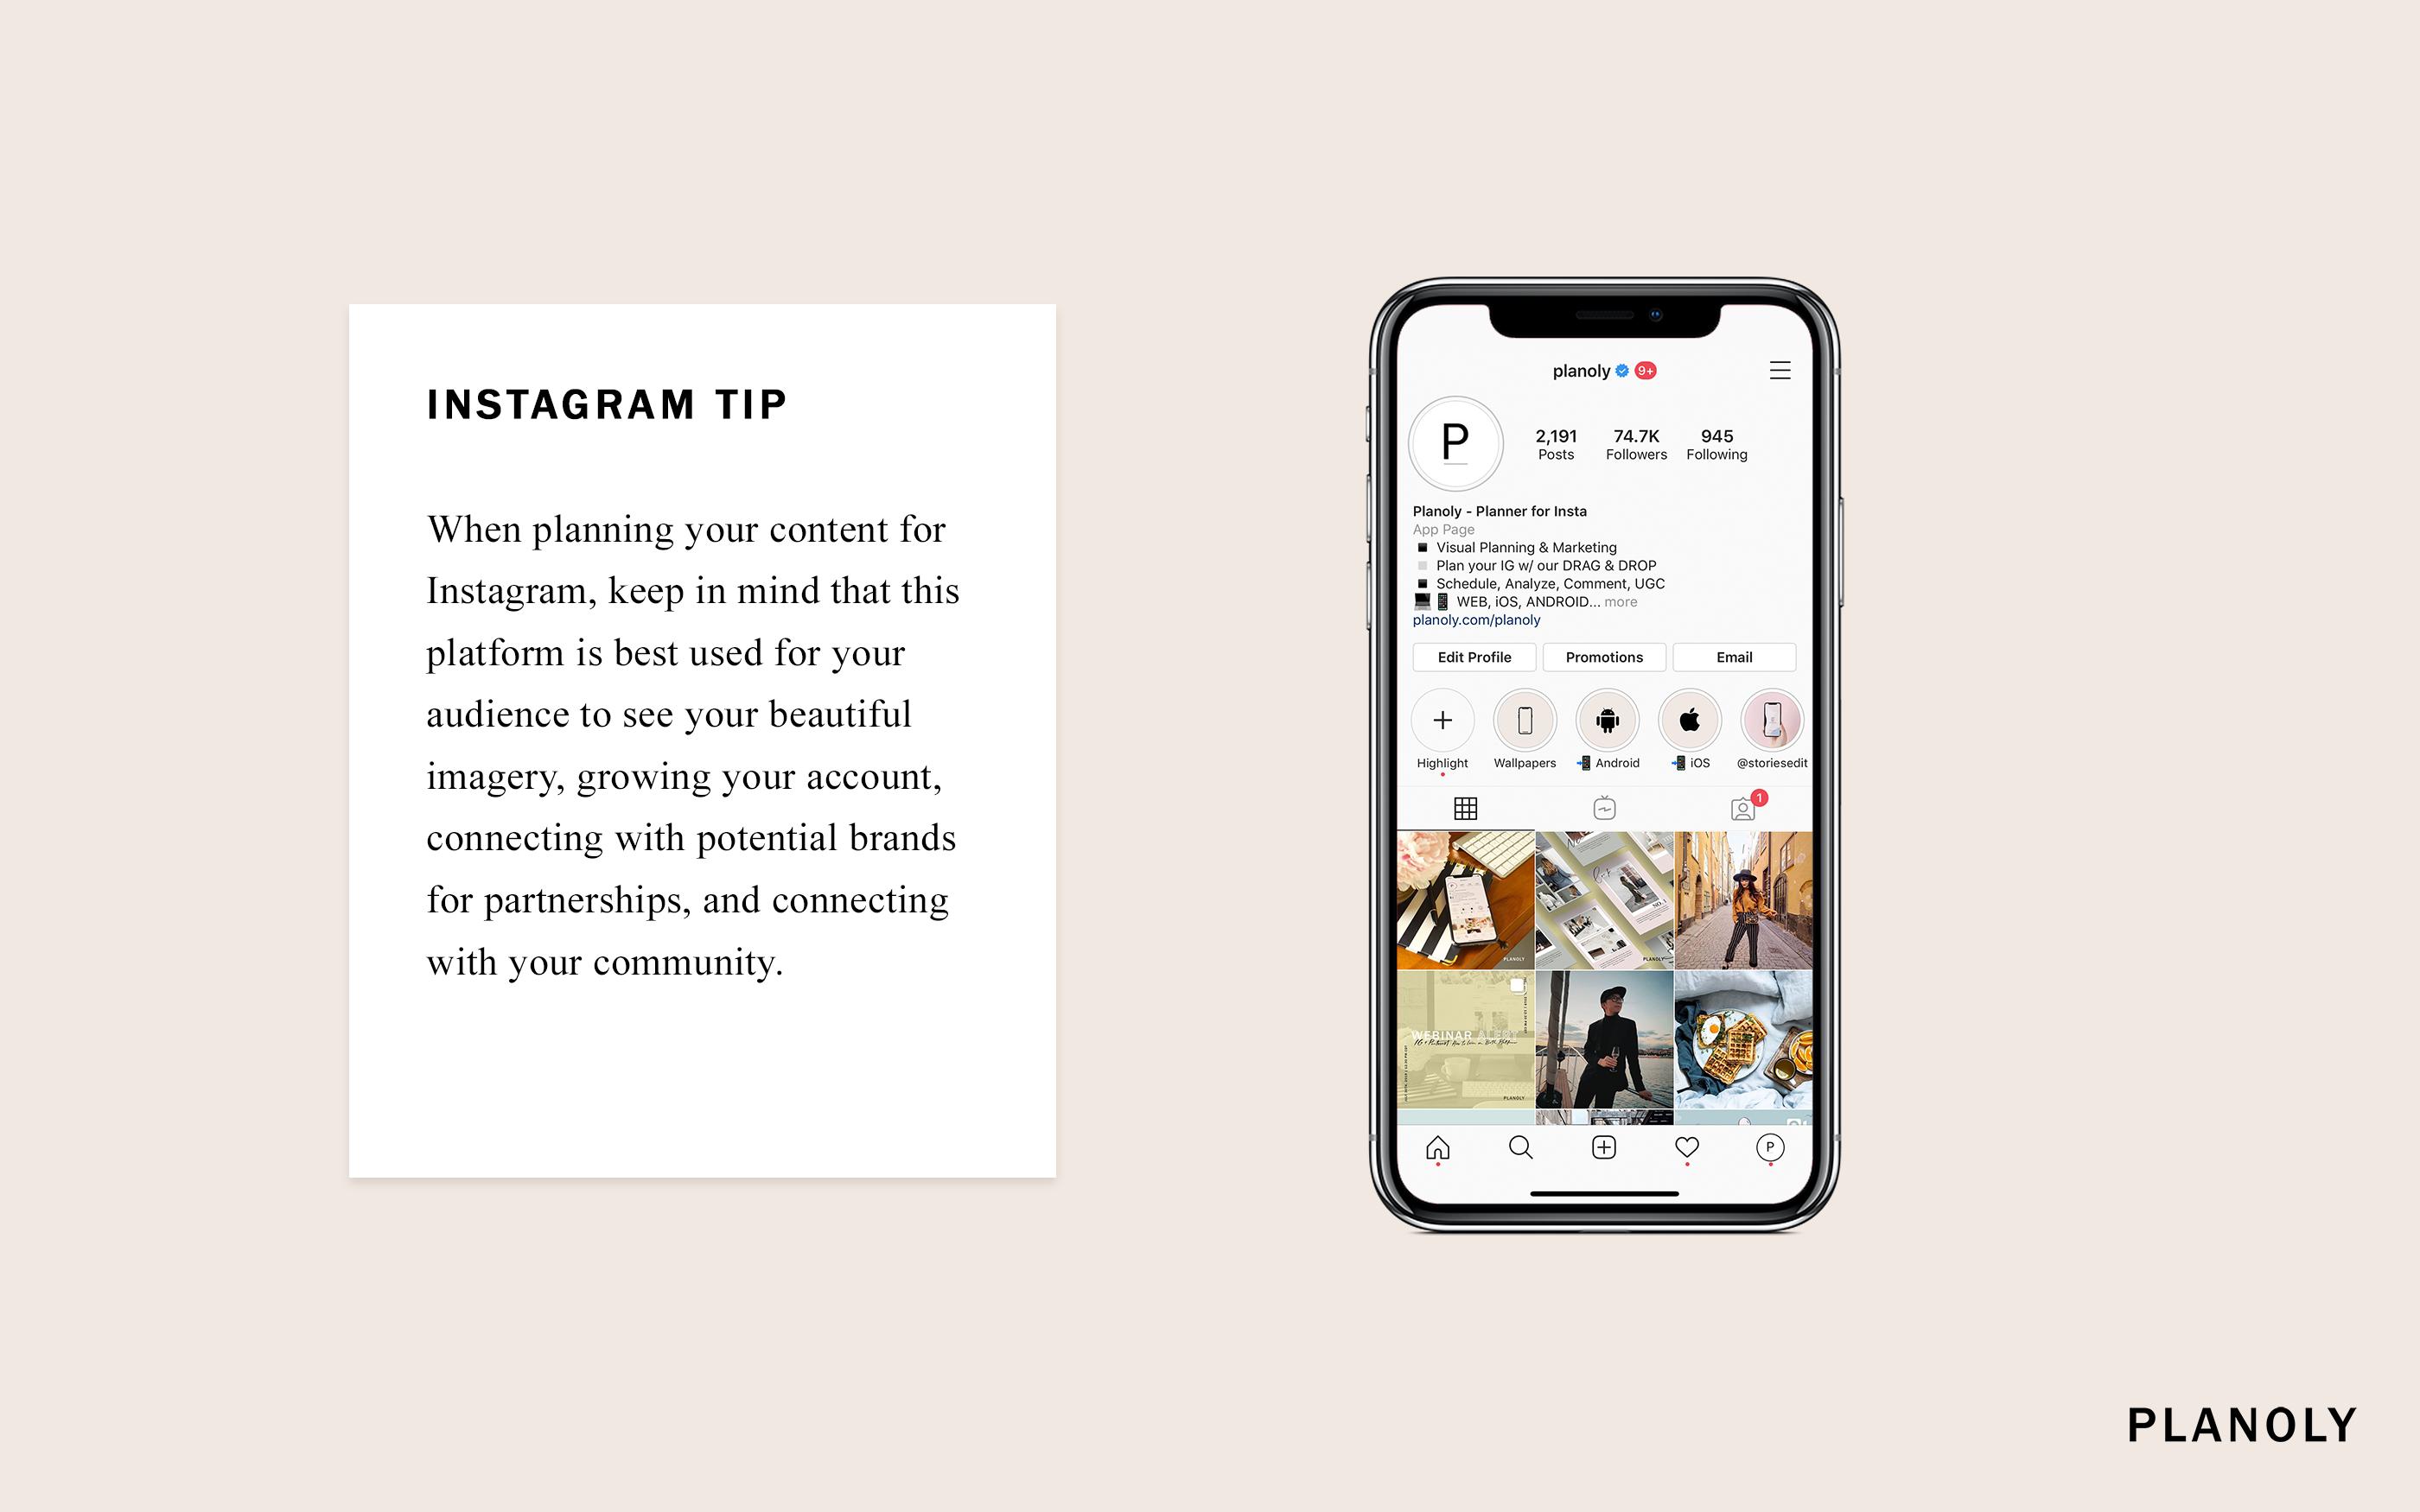 PLANOLY Instagram Tip